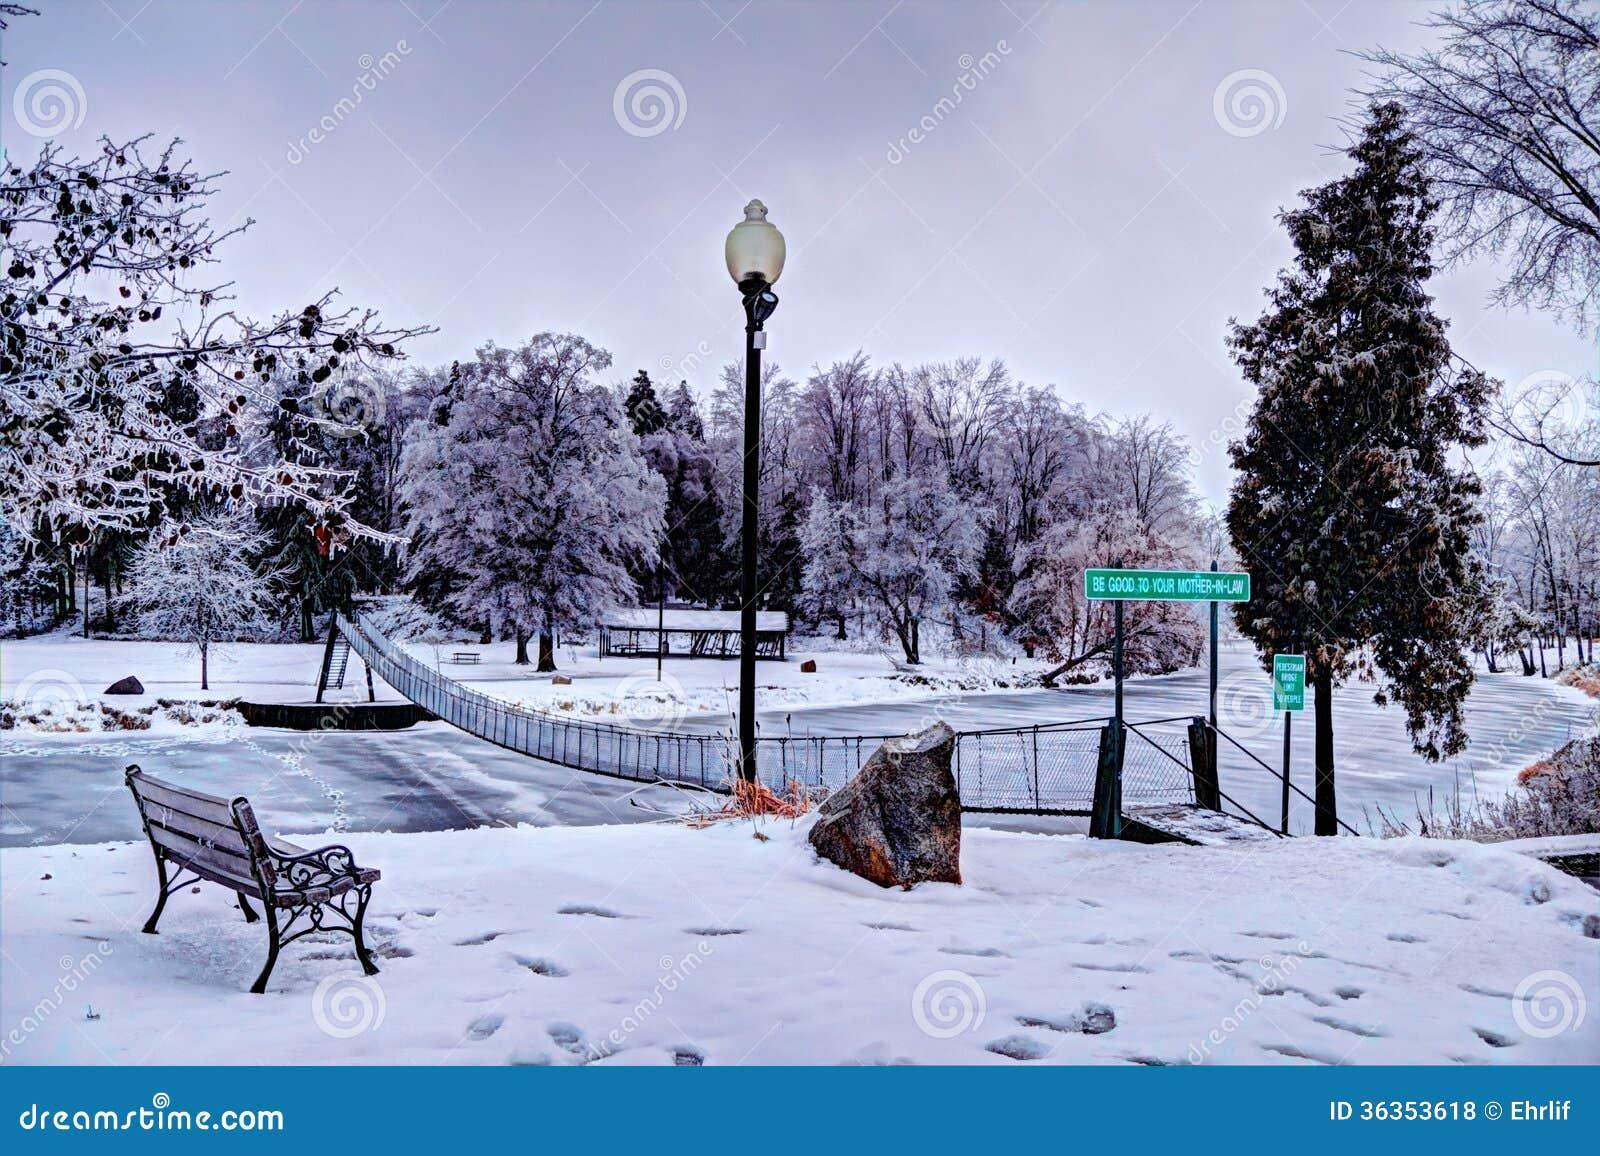 WInter Wonderland Royalty Free Stock Photos - Image: 36353618